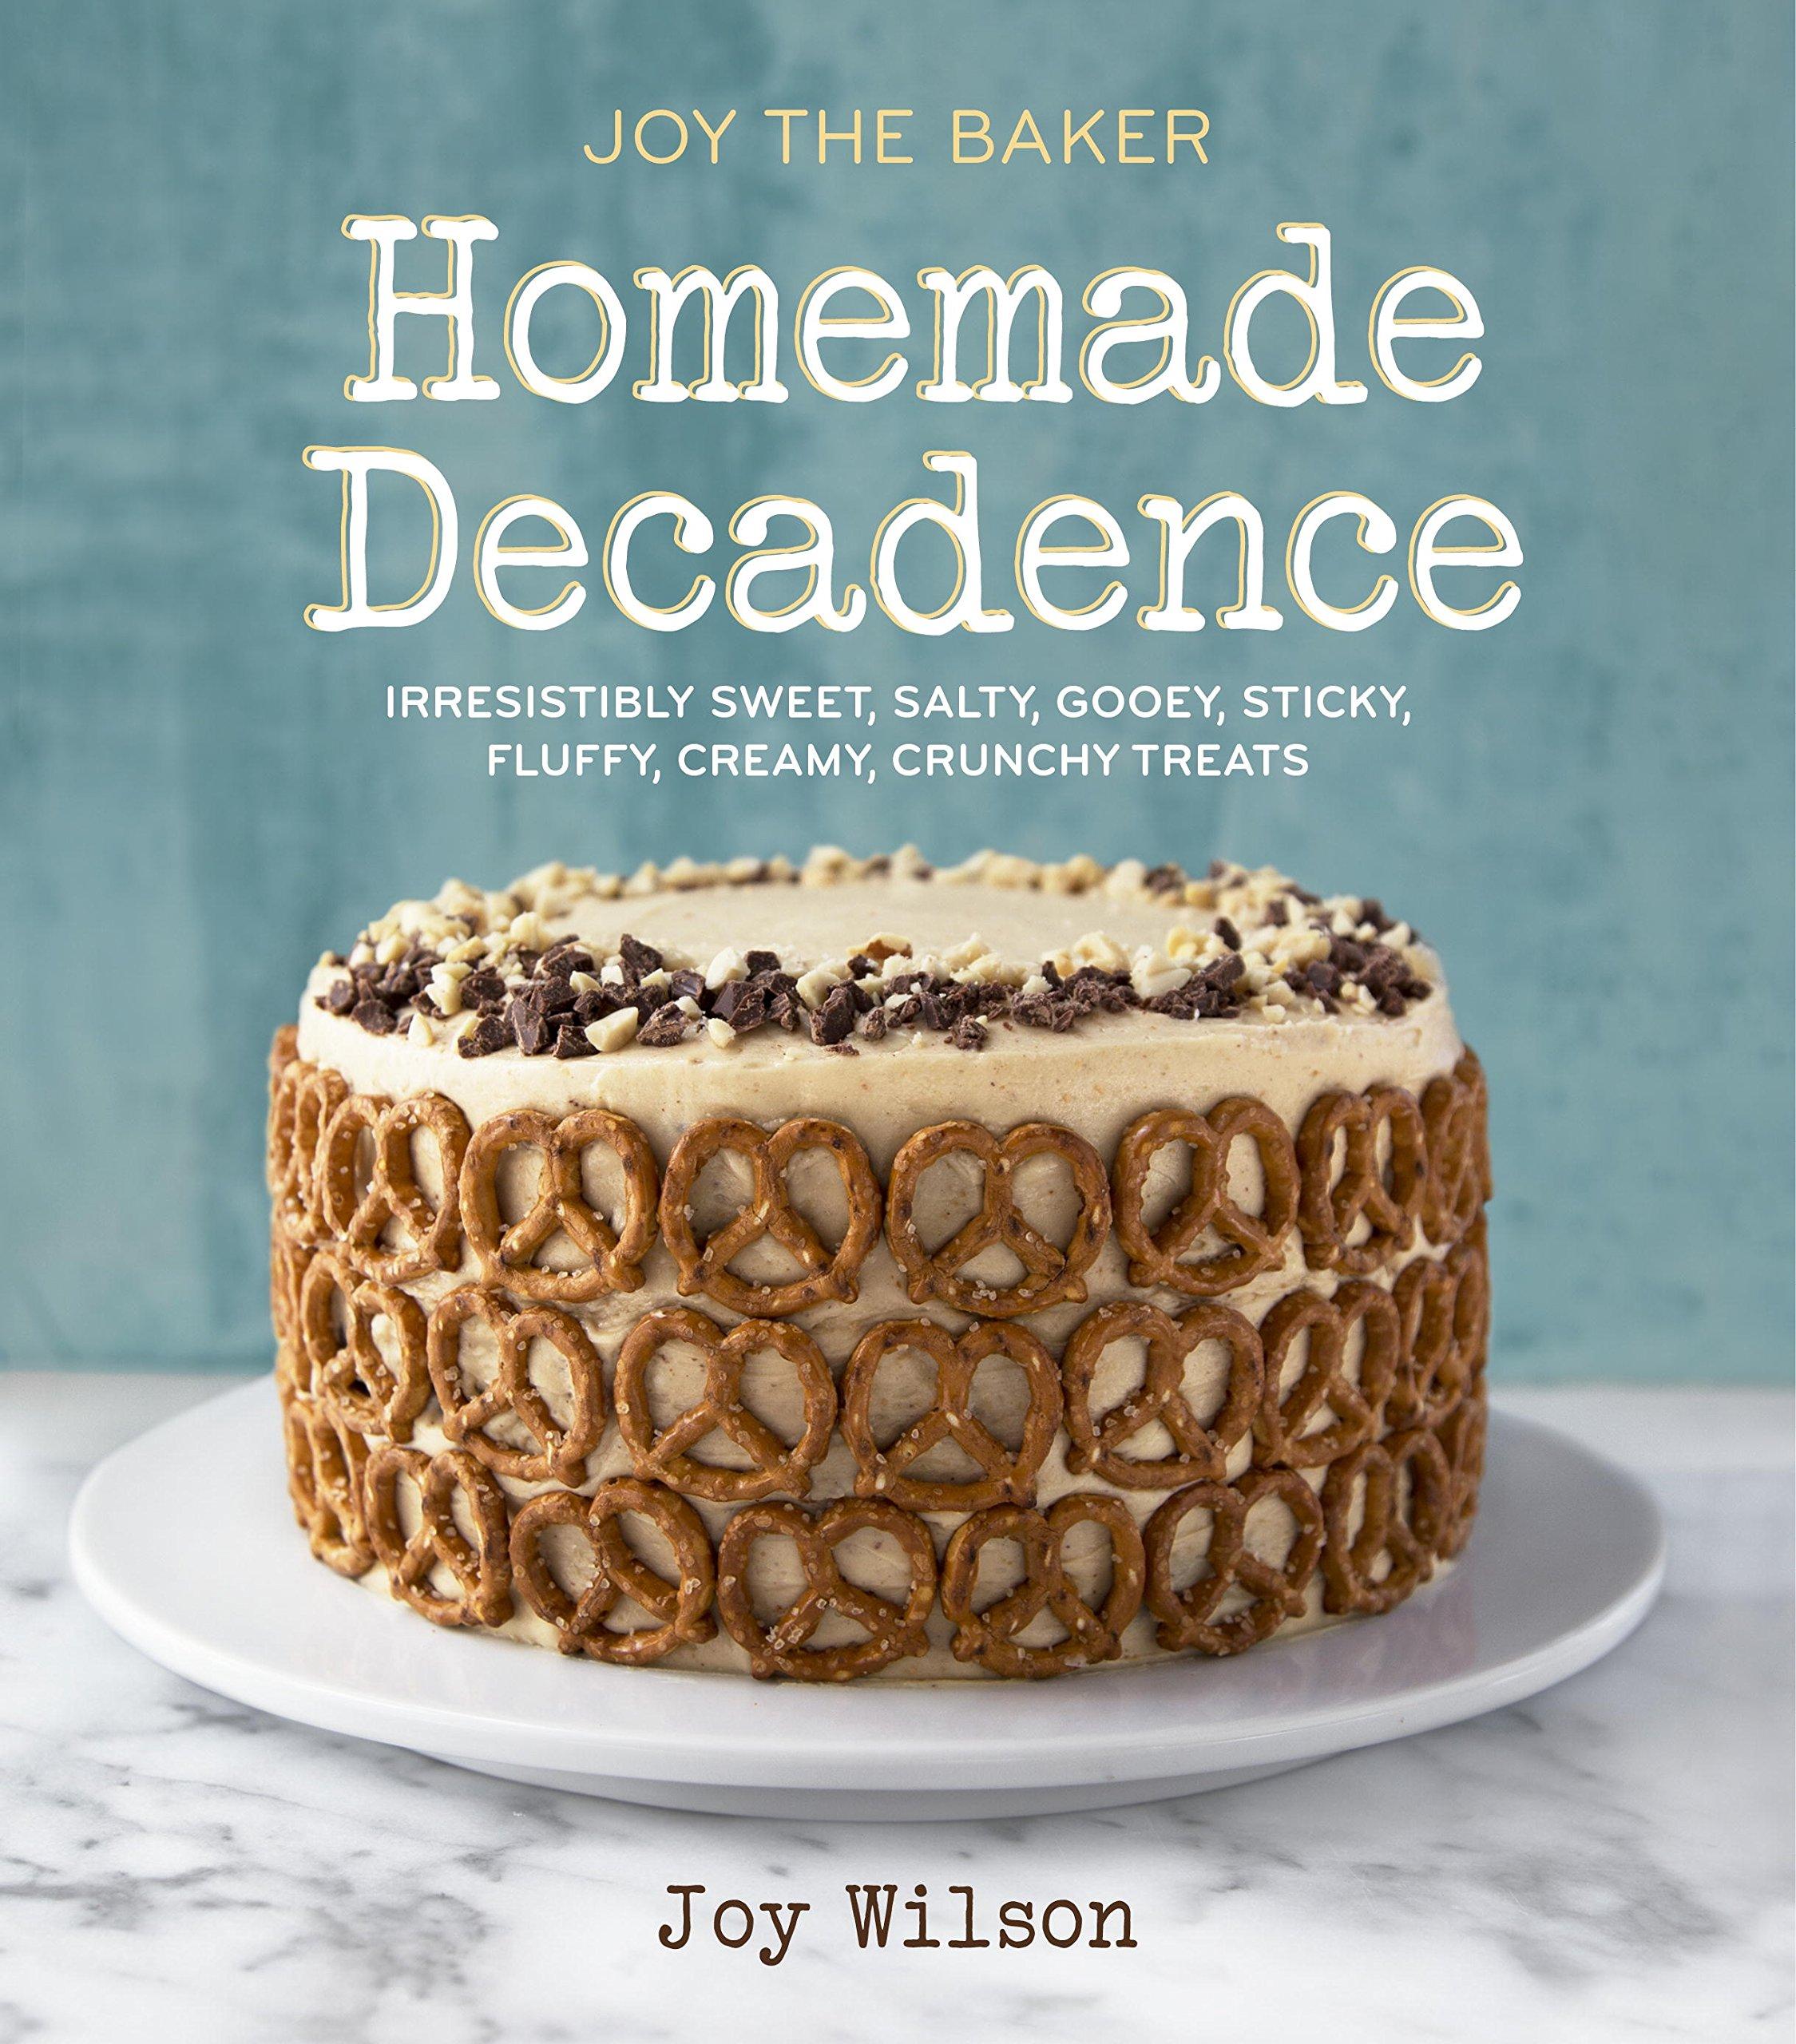 Joy Baker Homemade Decadence Irresistibly product image